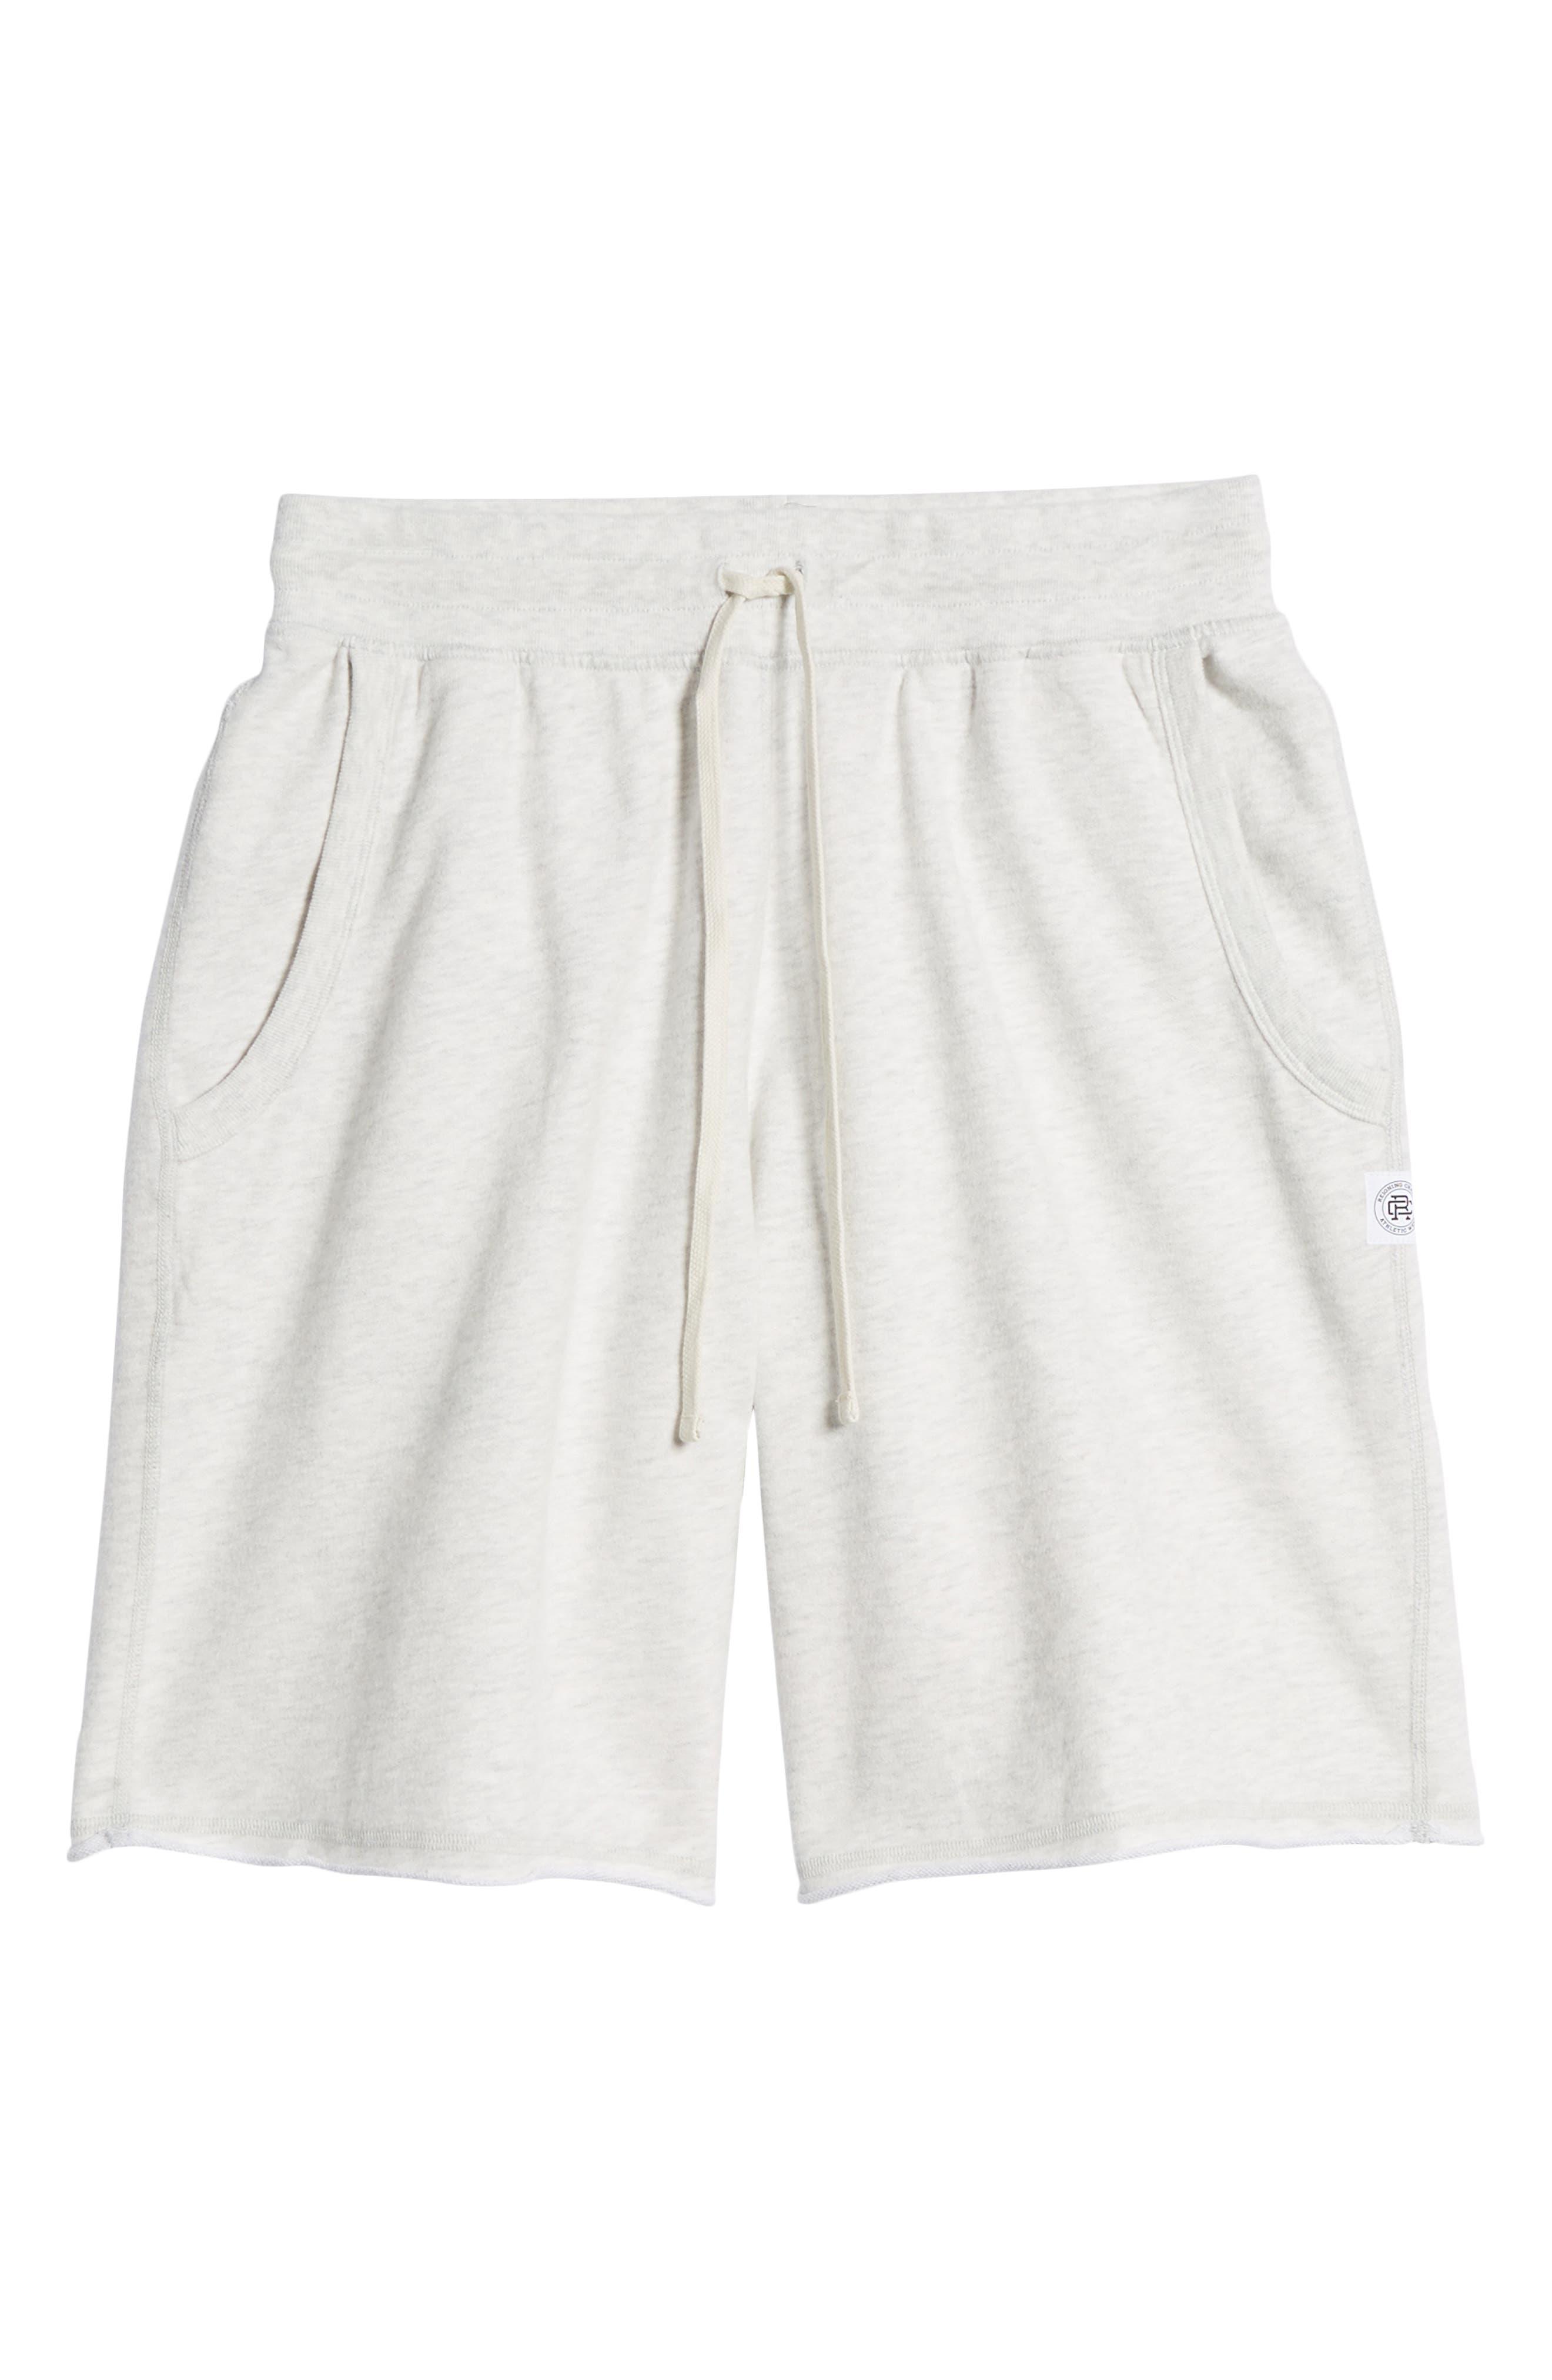 Raw Edge Drawstring Shorts,                             Alternate thumbnail 6, color,                             100